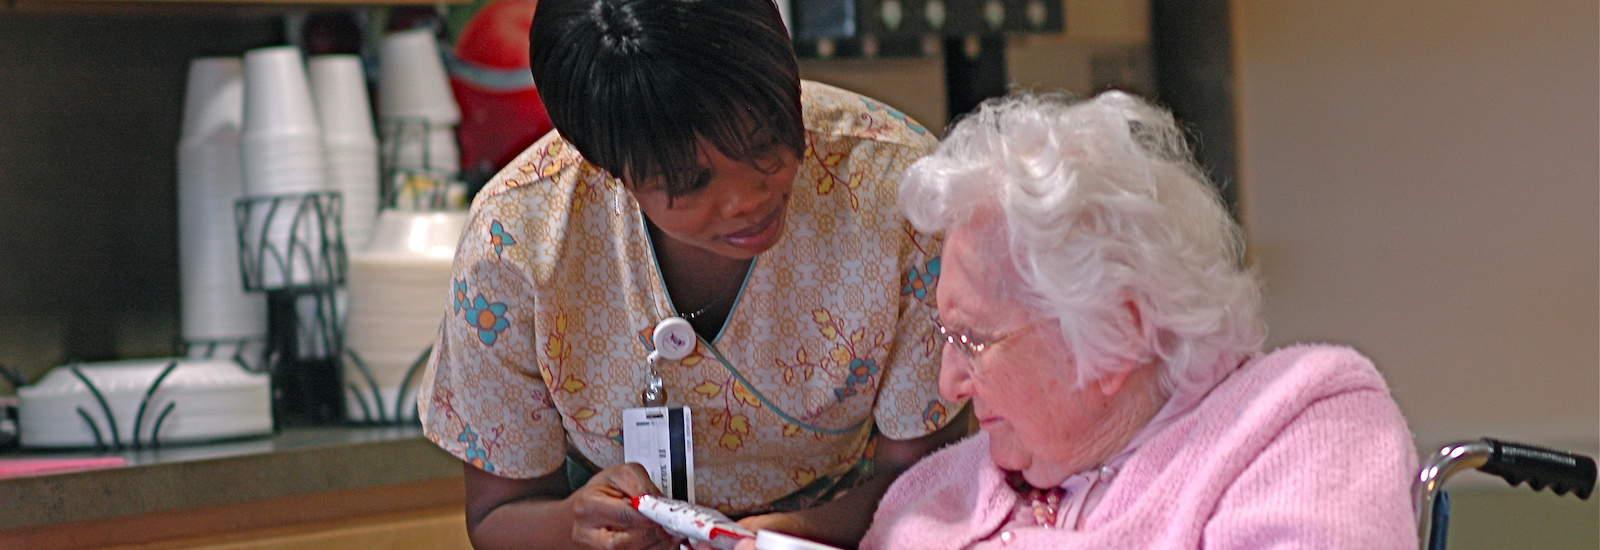 memory care nurse